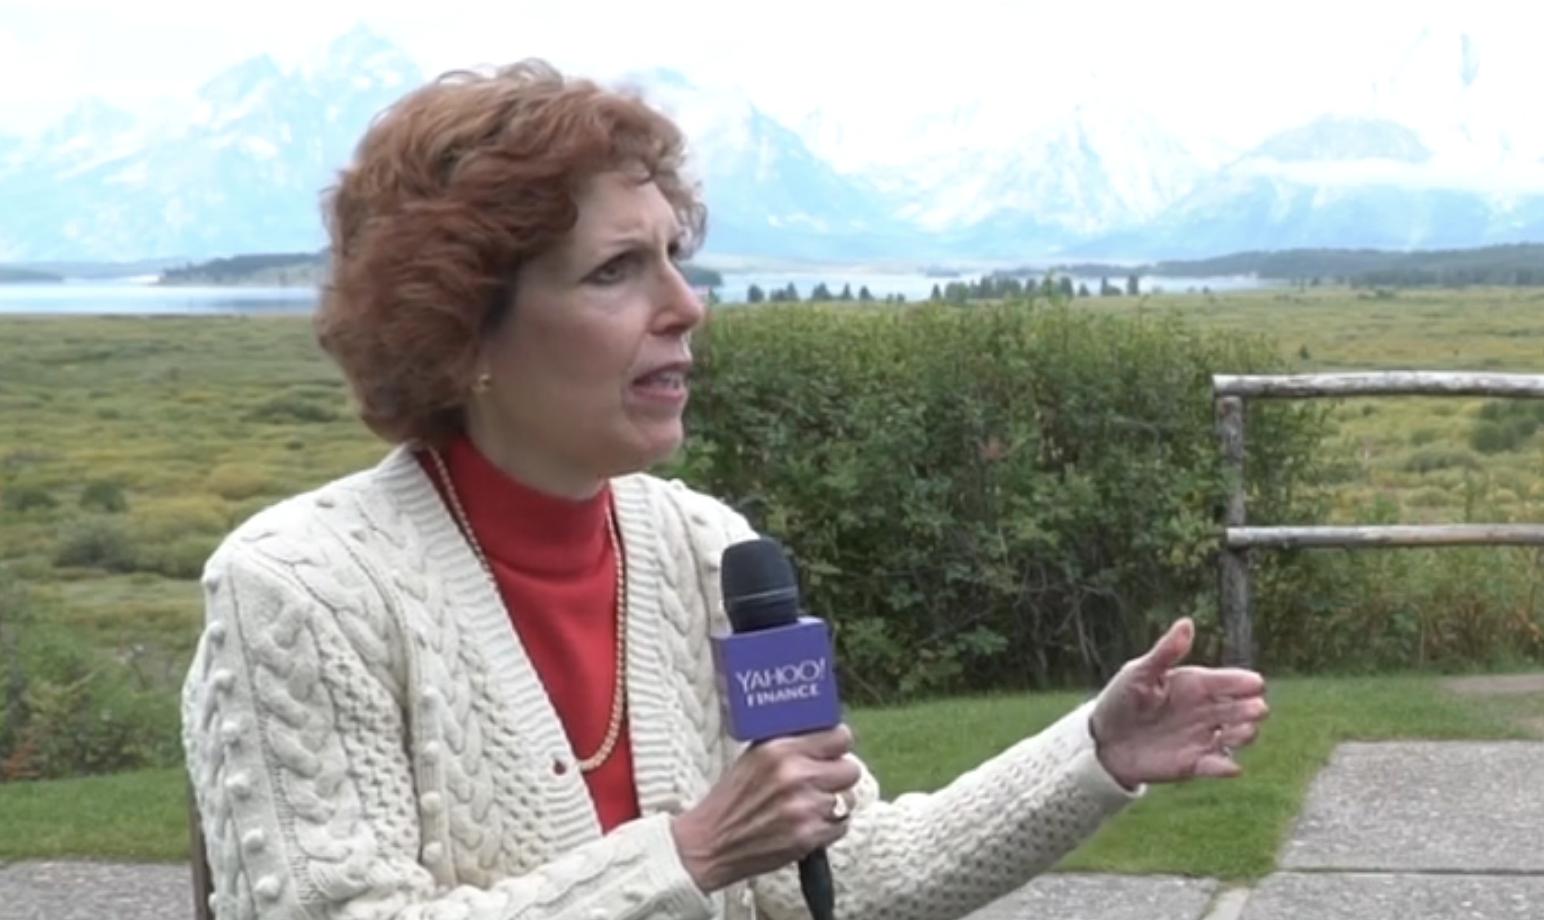 Cleveland Fed's Loretta Mester speaks with Yahoo Finance [Transcript]